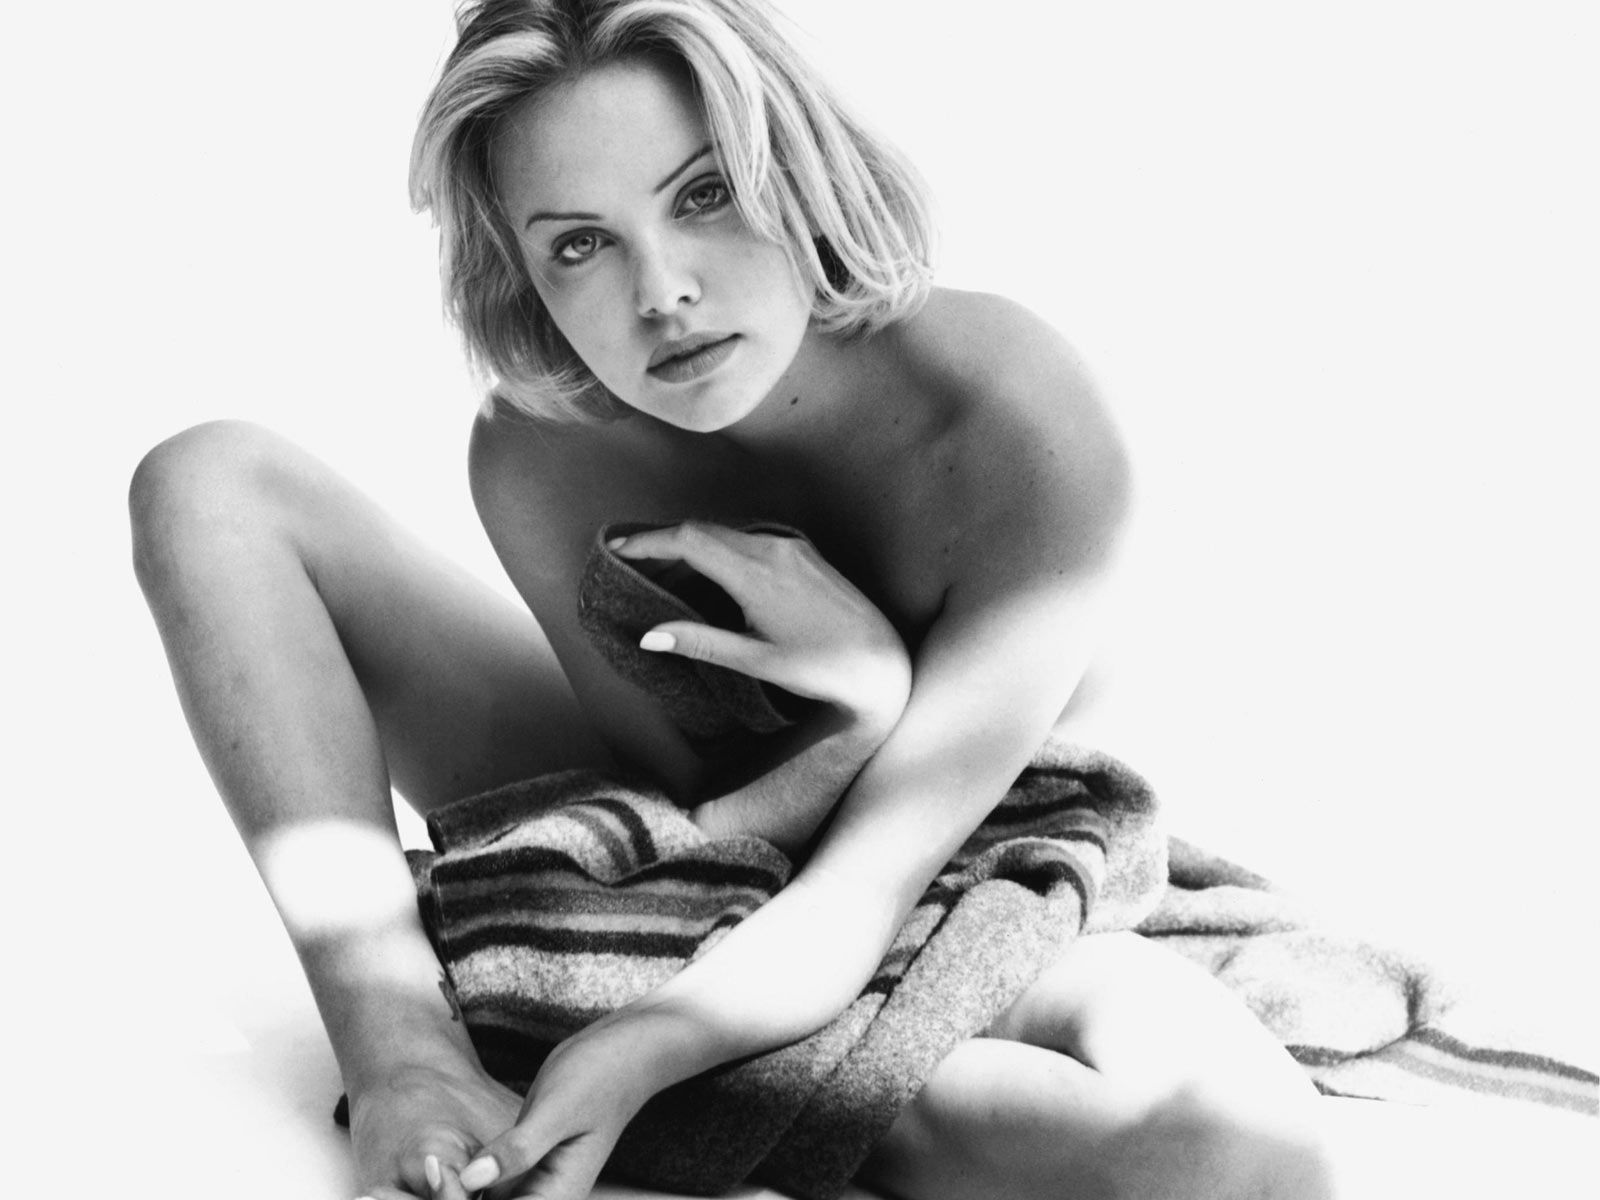 Hot nude Charlize Theron wallpaper hd. at 1:12 AM